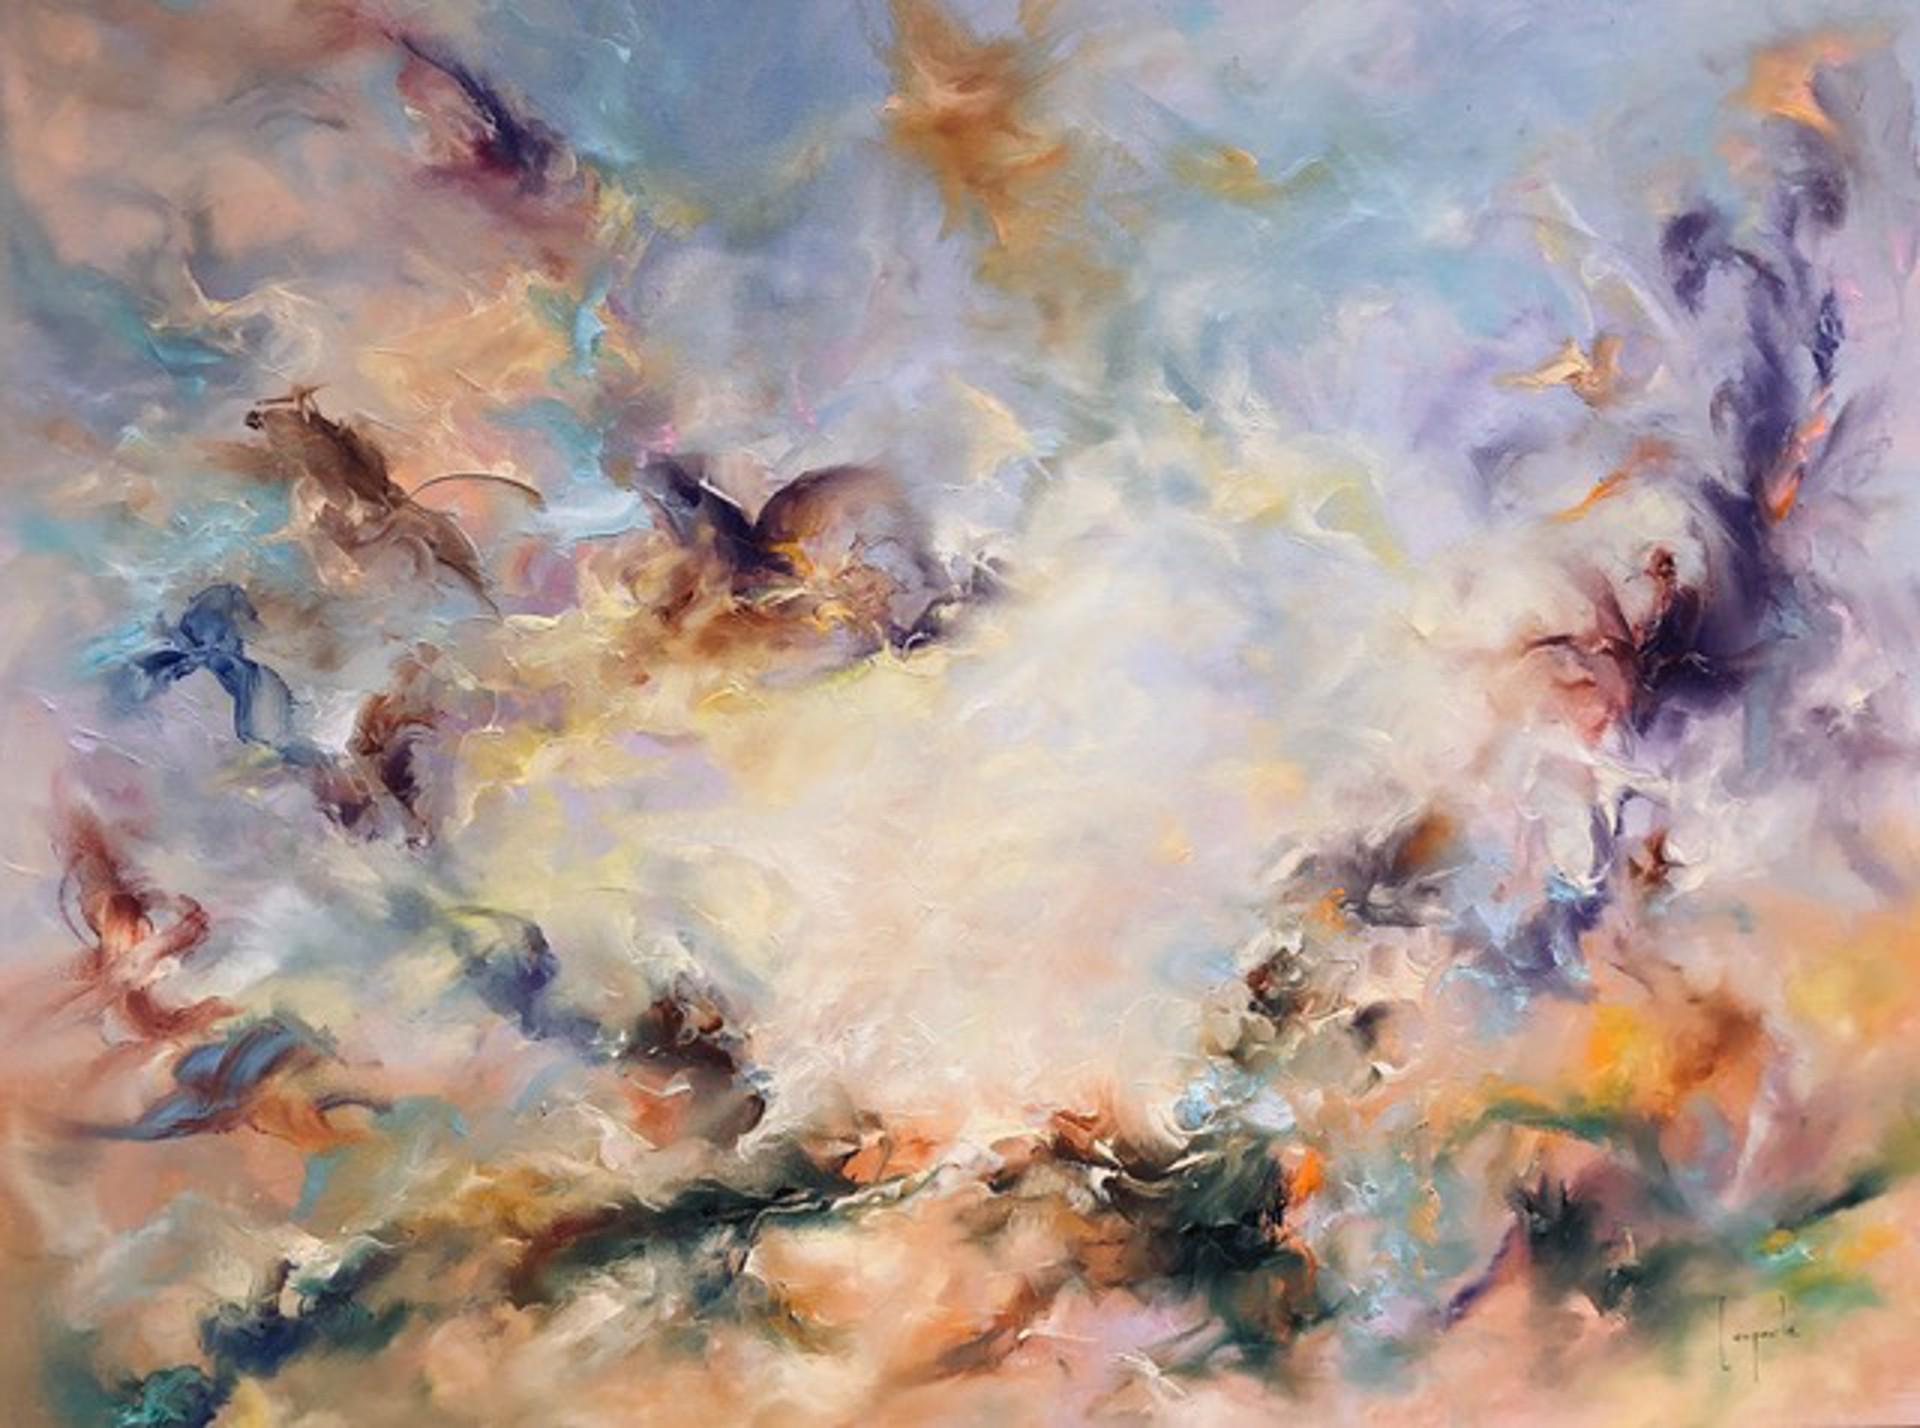 Eternal Bliss by Dario Campanile